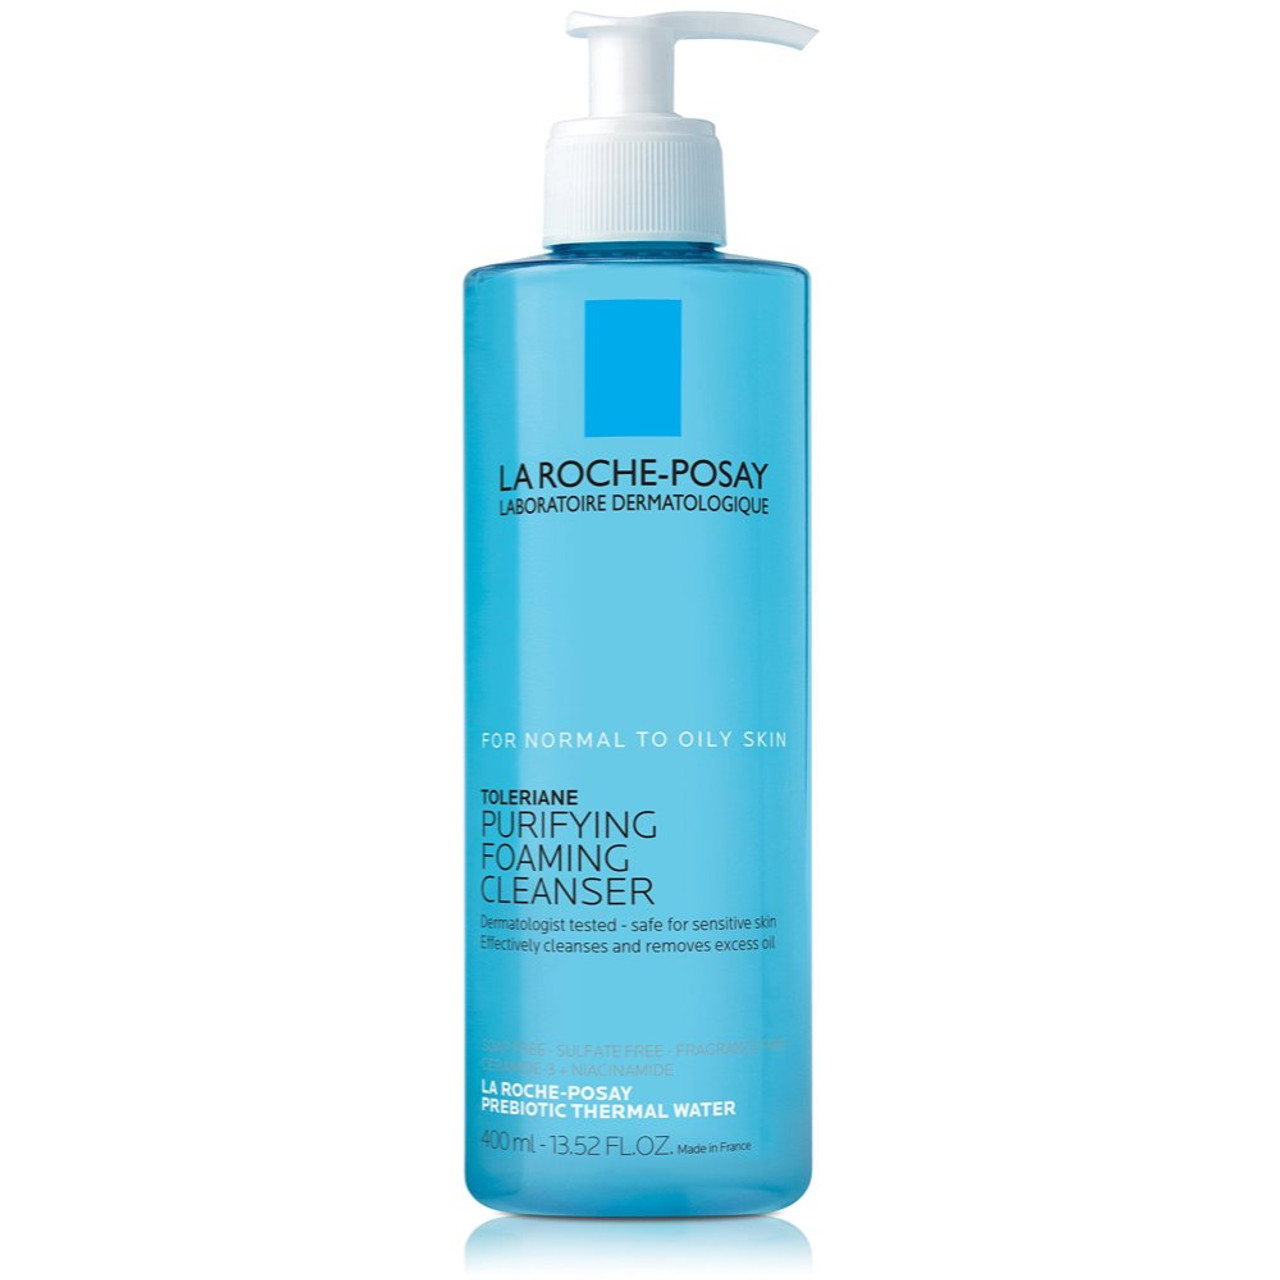 La Roche Posay Toleriane Purifying Foaming Cleanser